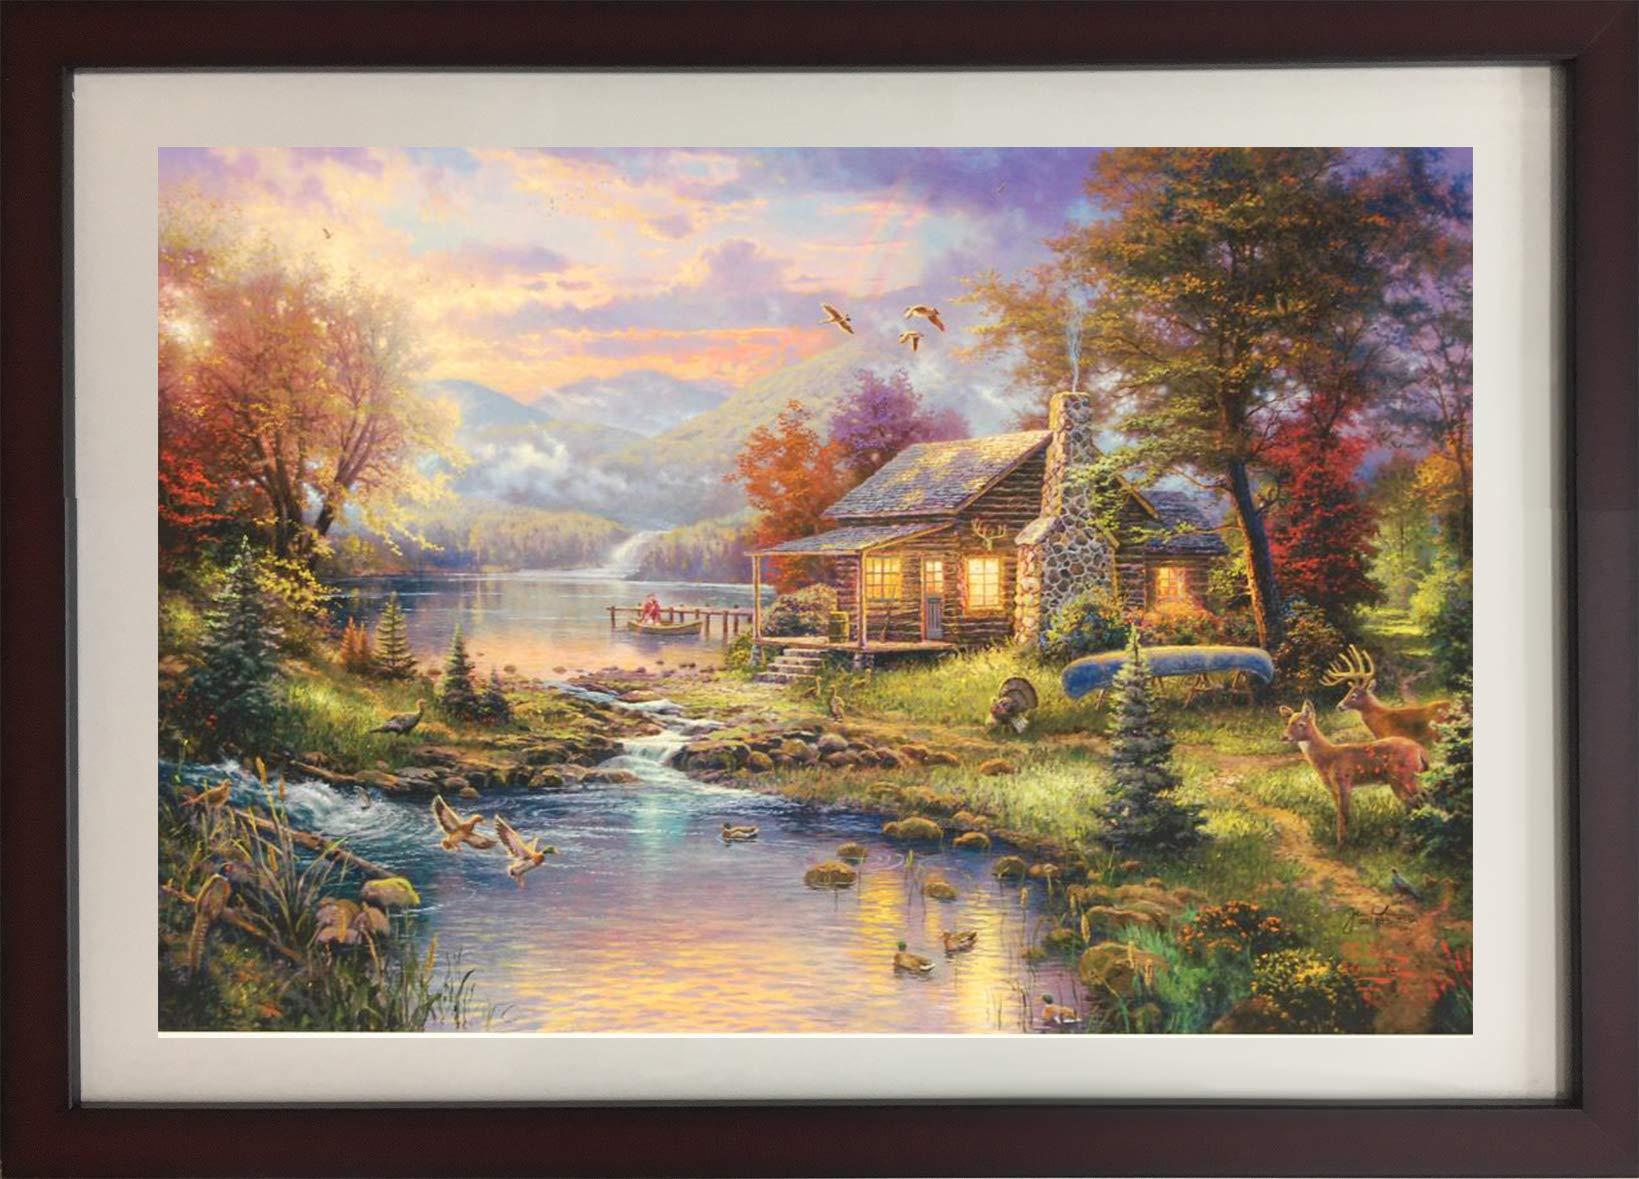 ''Mountain Retreat III'' Original Thomas Kinkade Lithograph Fine Art Landscape Decorative by